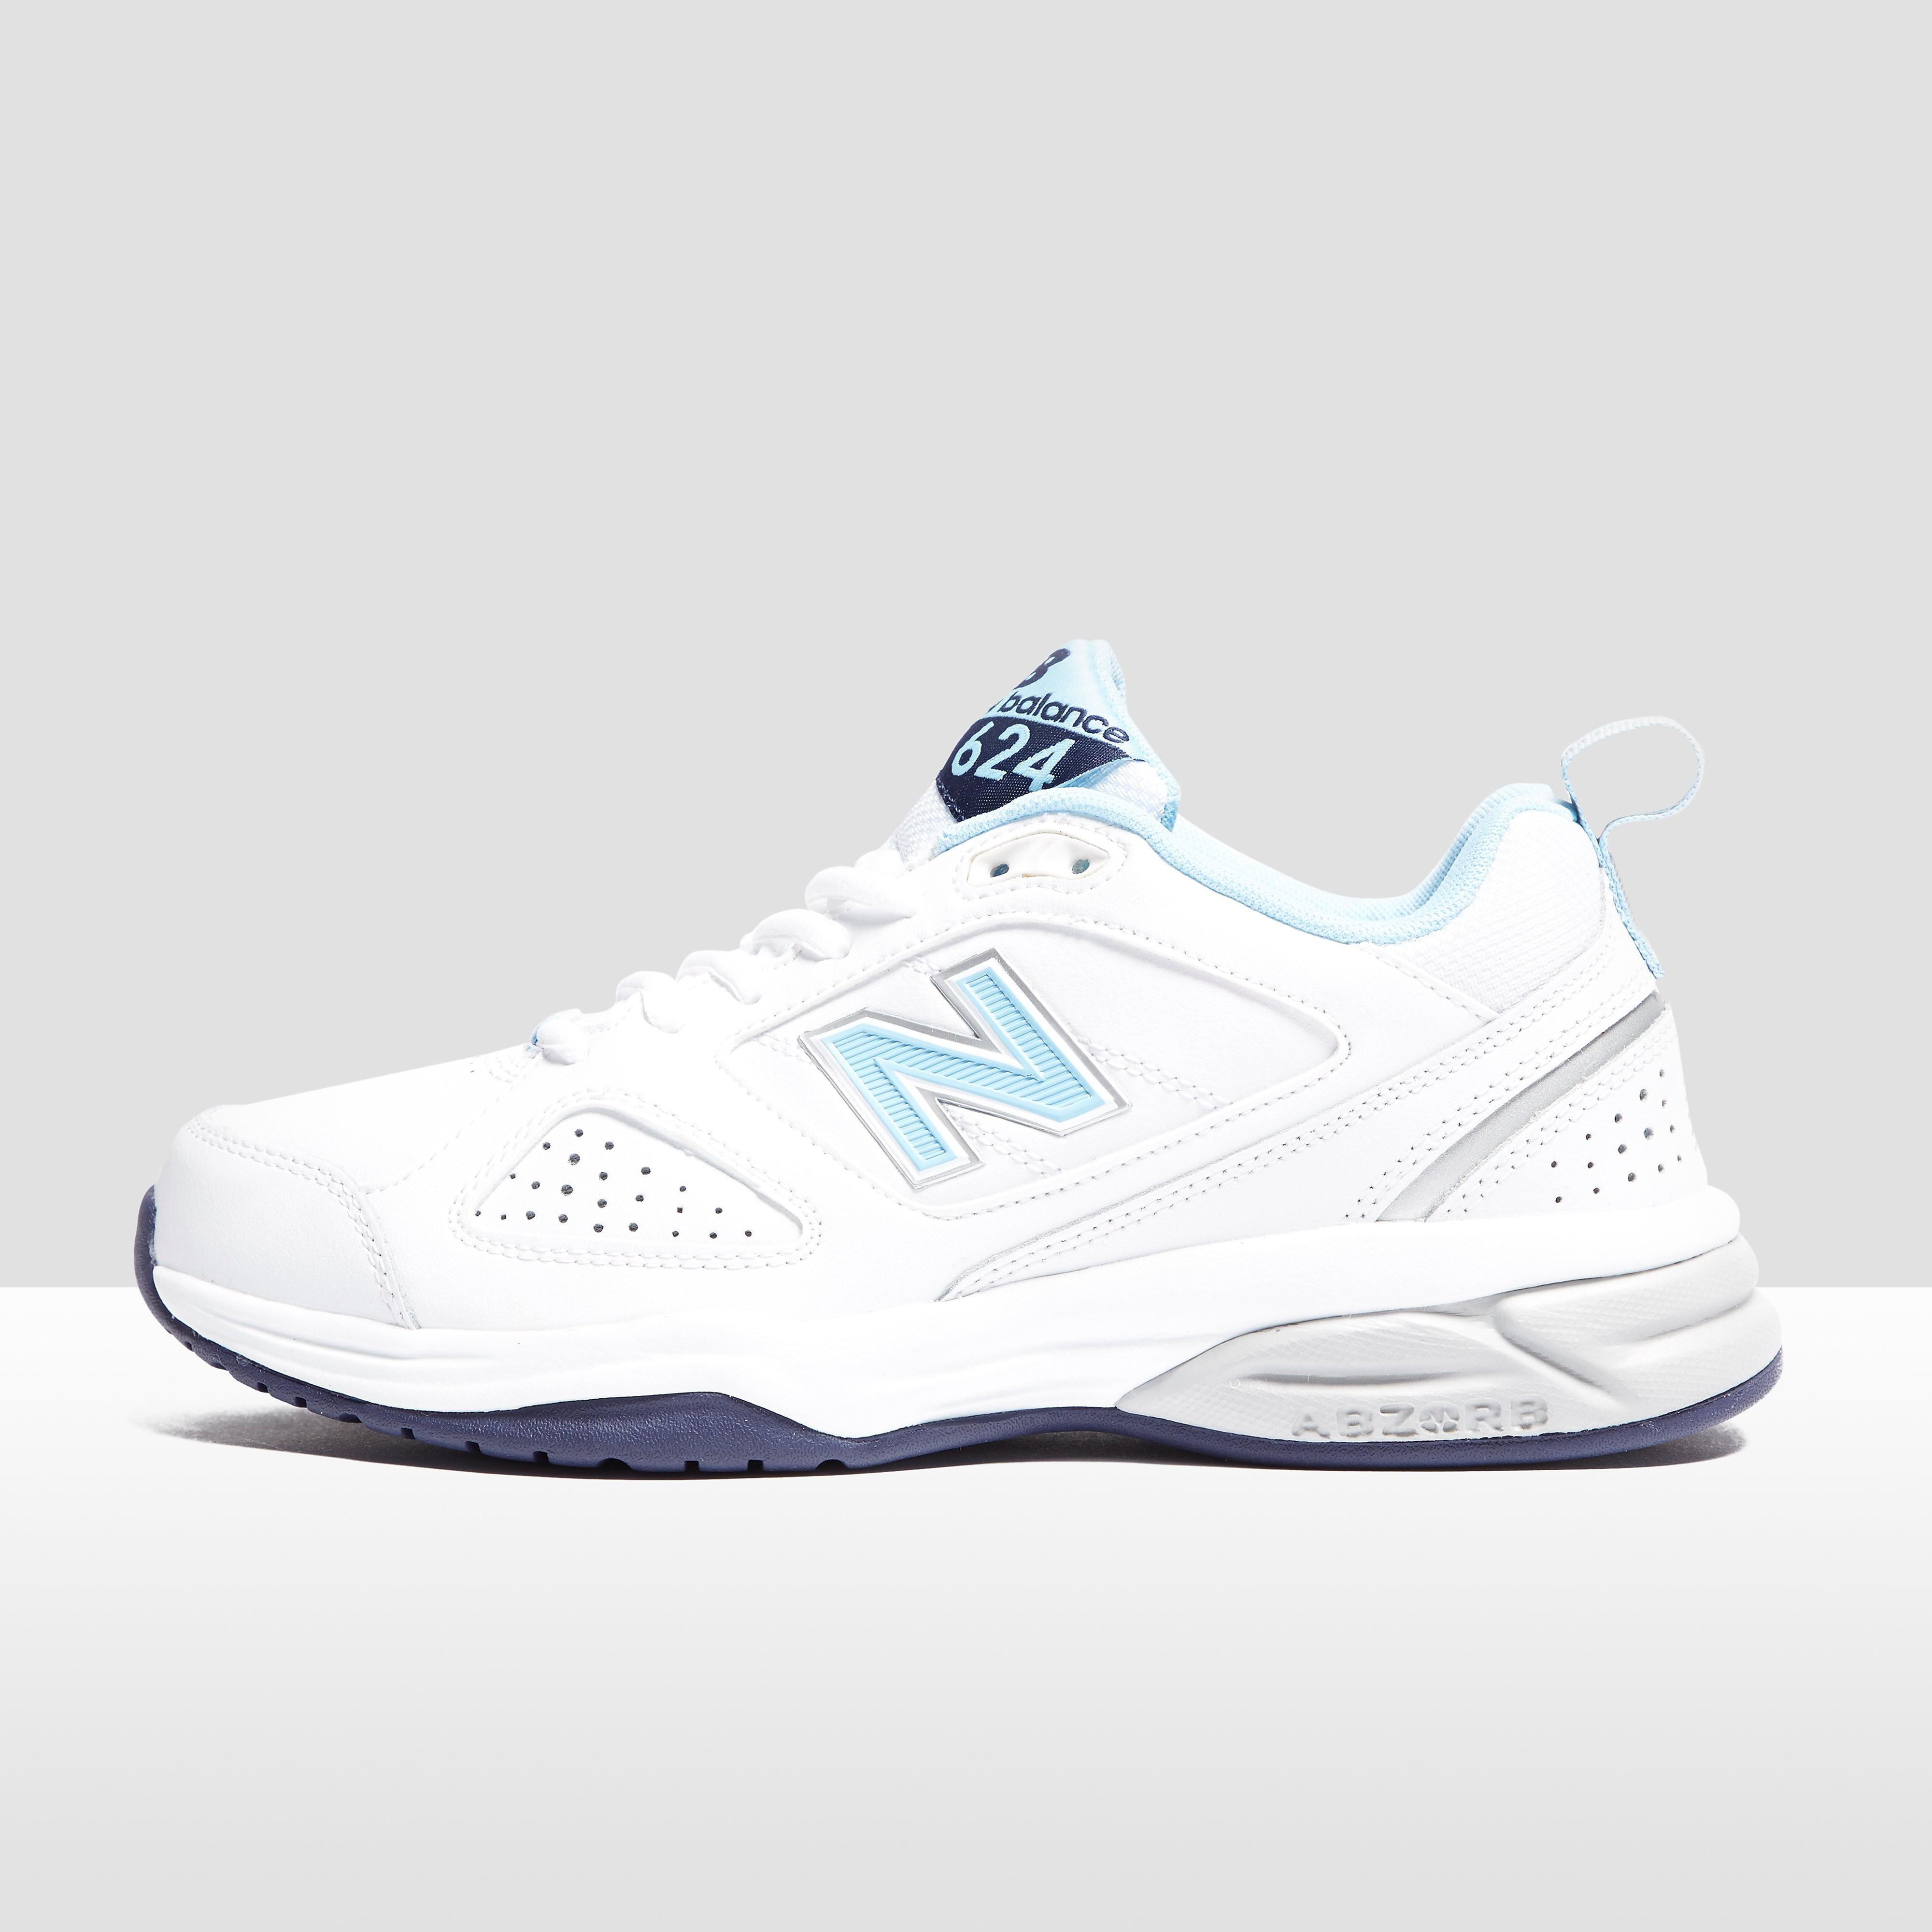 New Balance 624v4 Women's Fitness Shoes